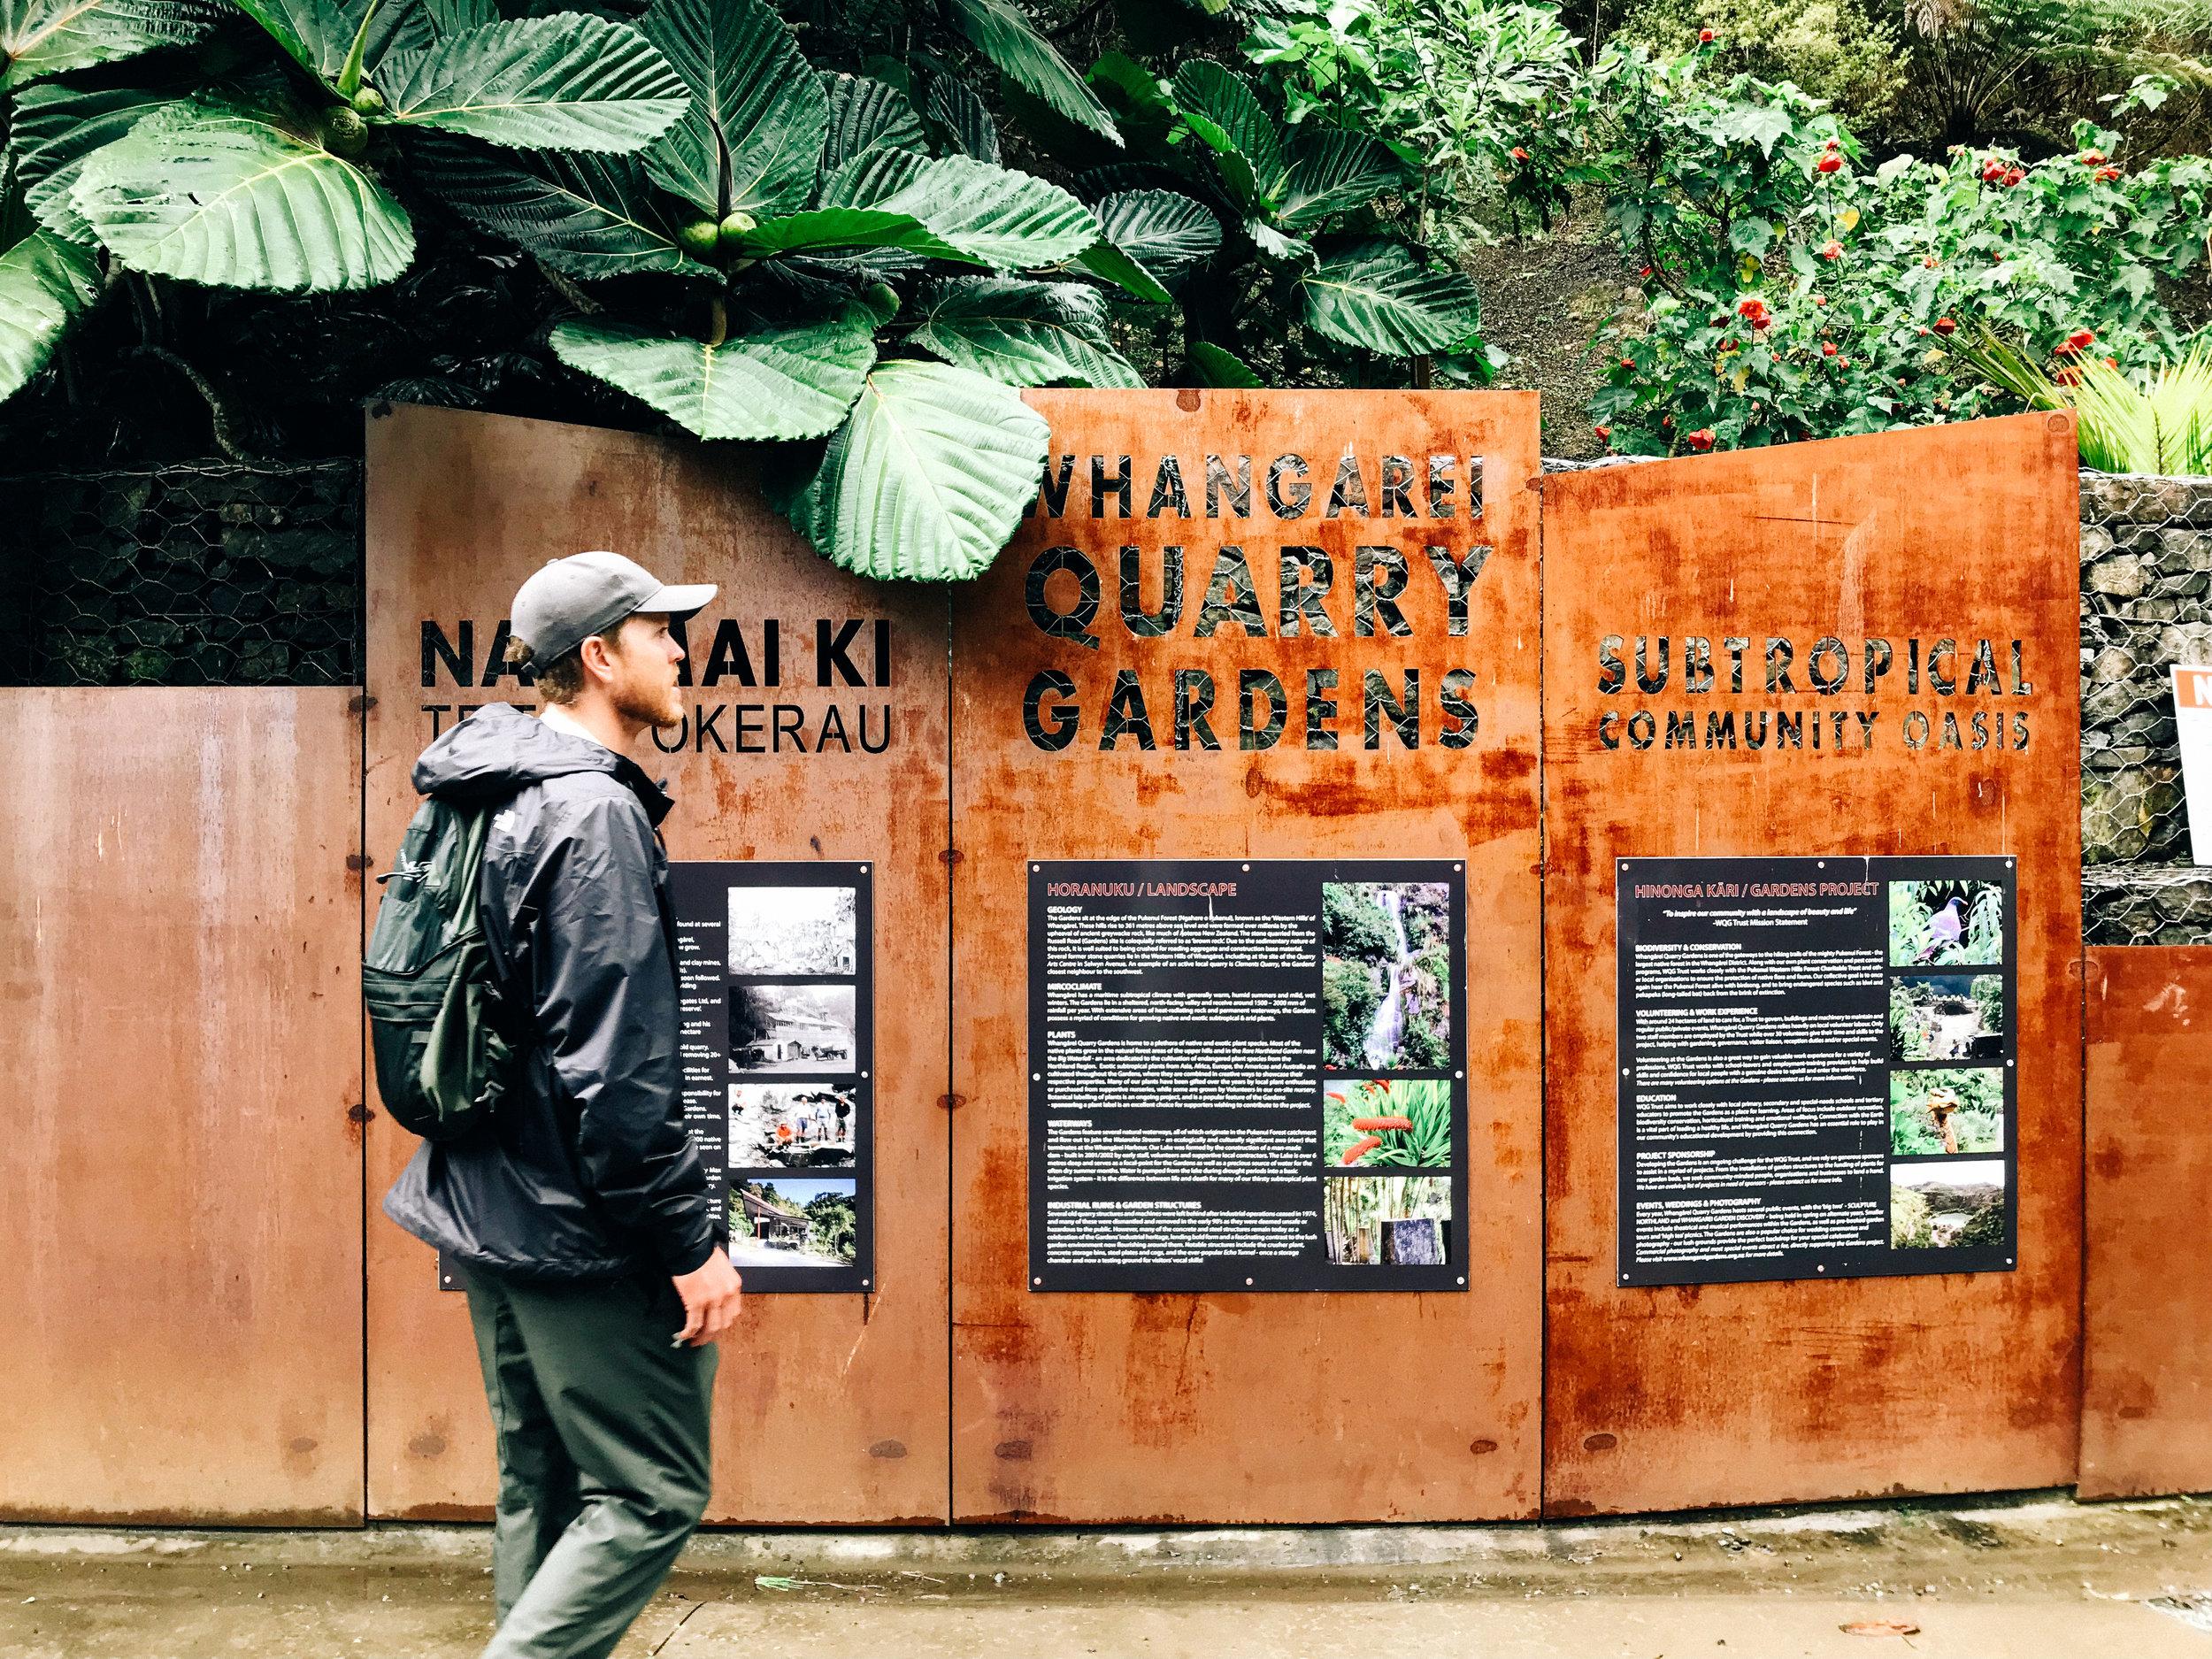 Quarry Gardens in Whangarei, NZ